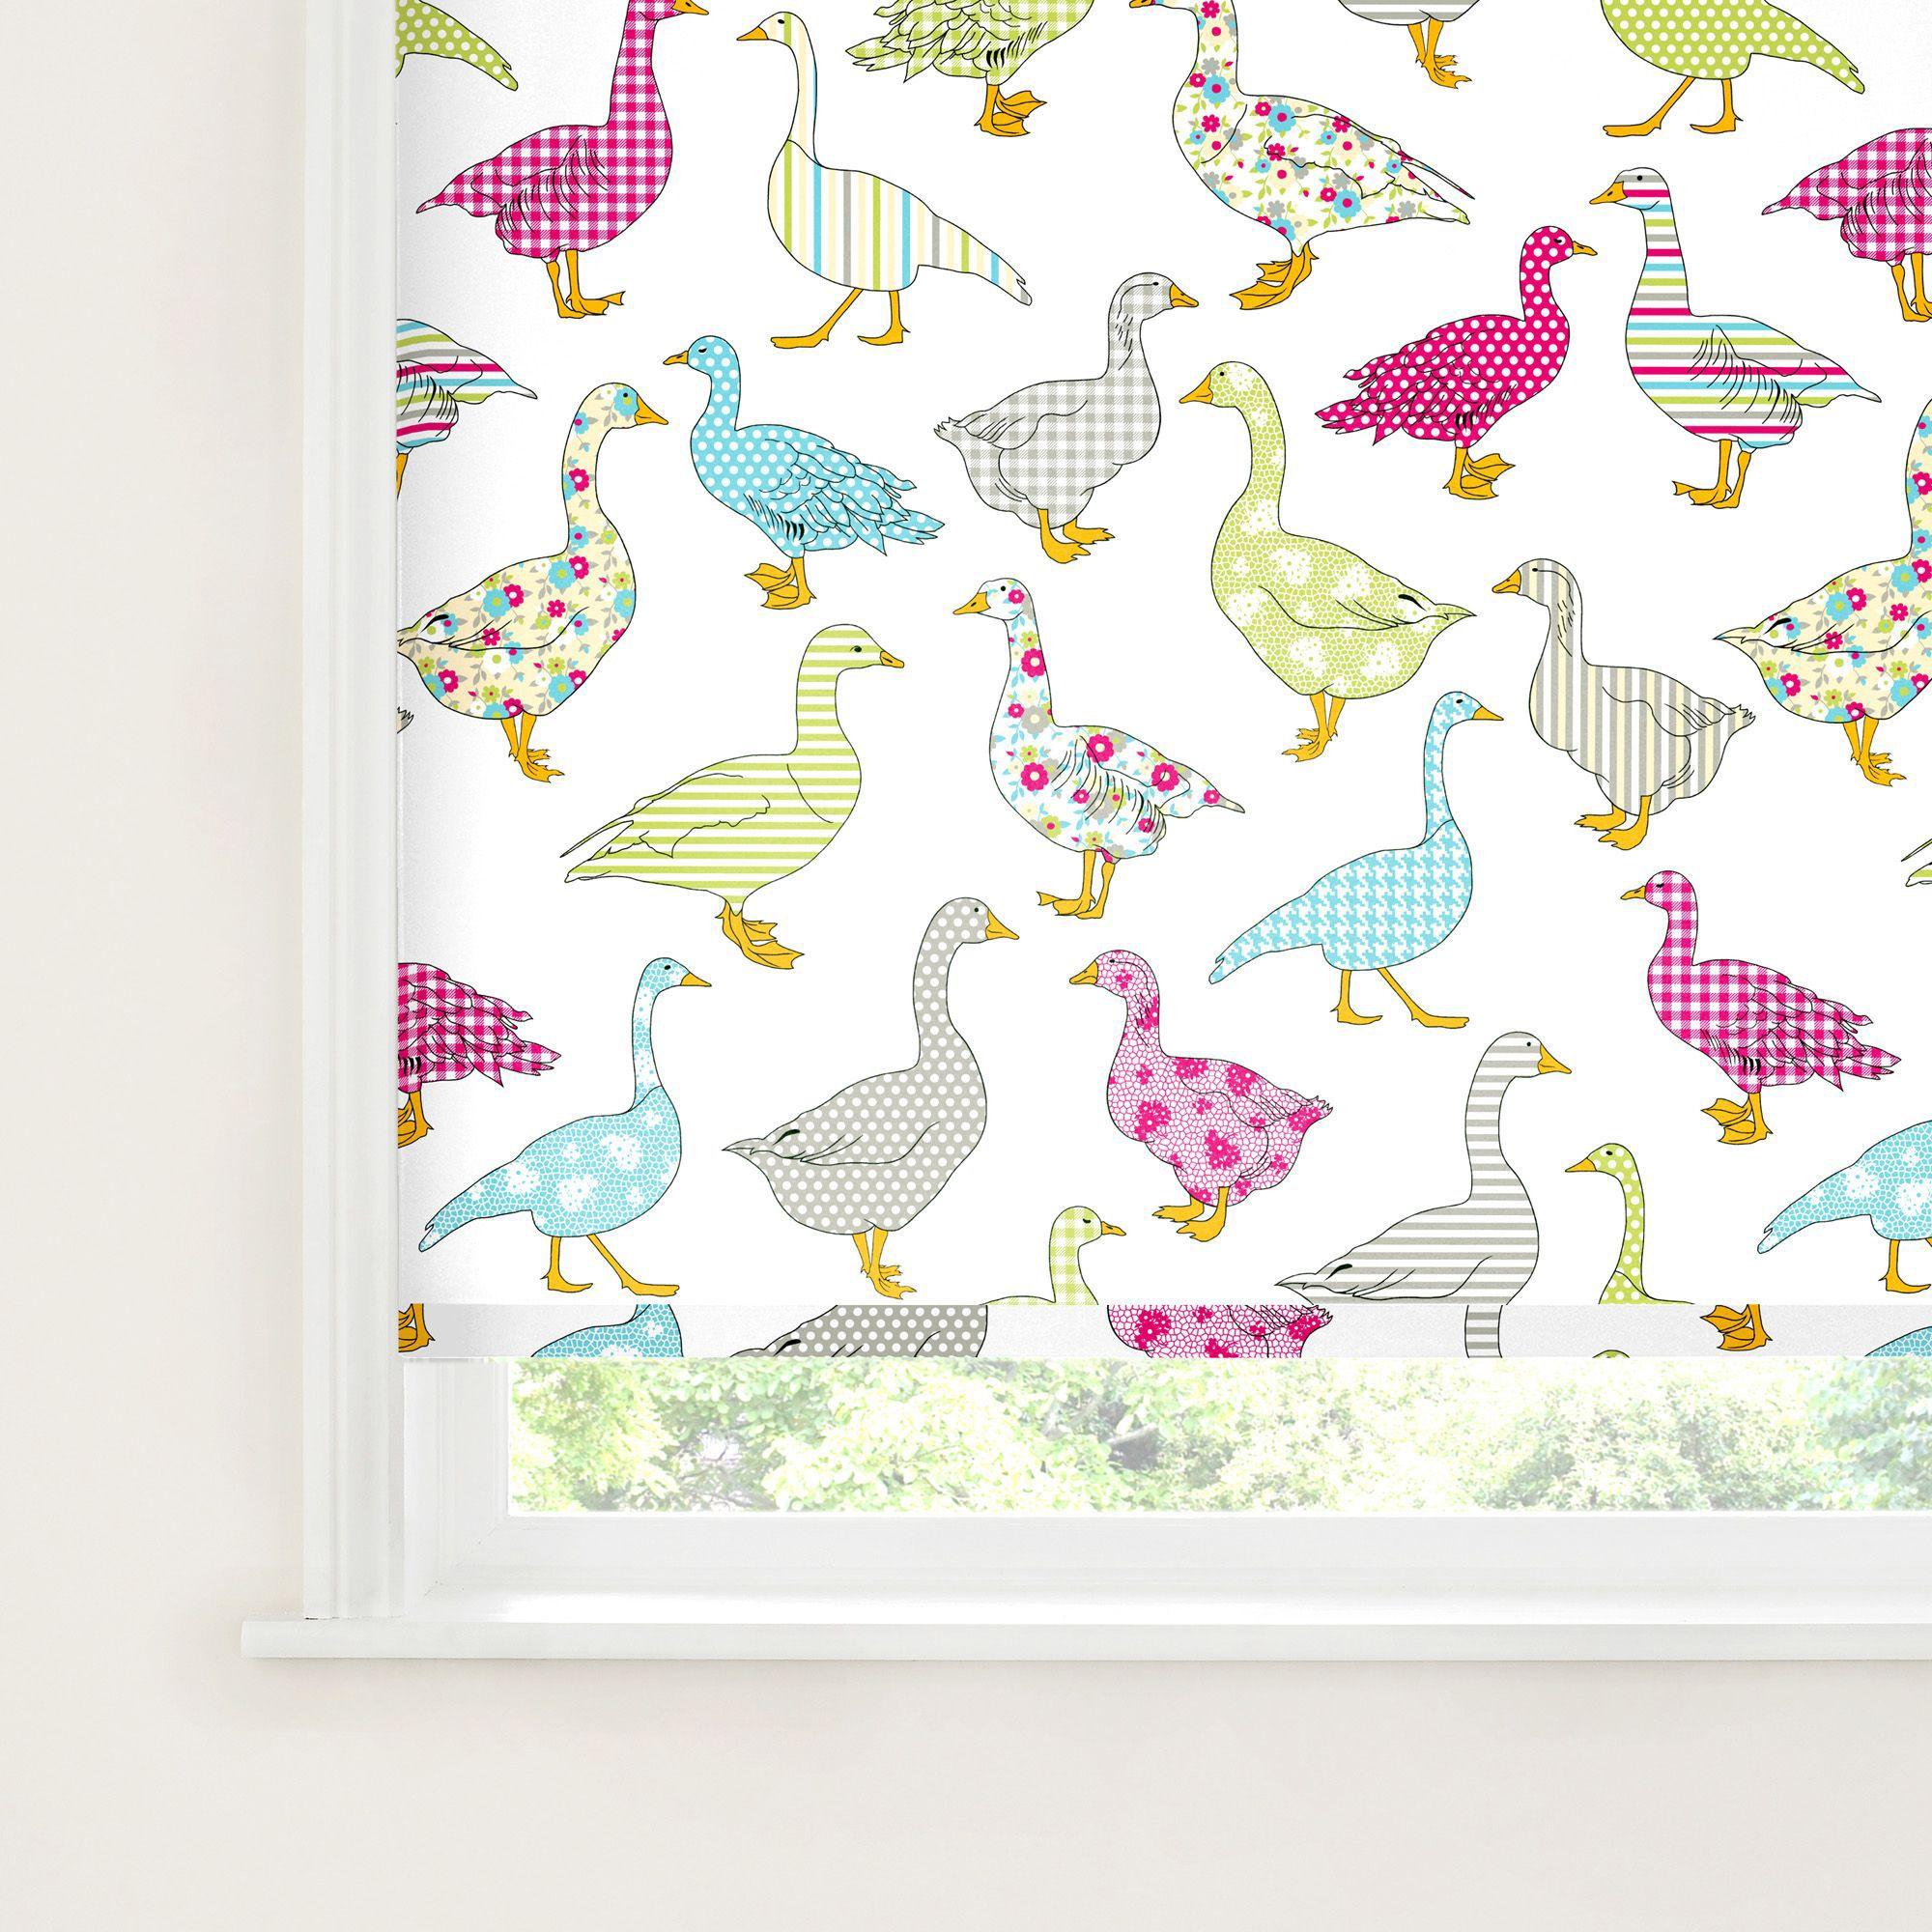 Bathroom Window Blinds B&Q colours nerine corded blue, pink & white roller blind (l)160 cm (w